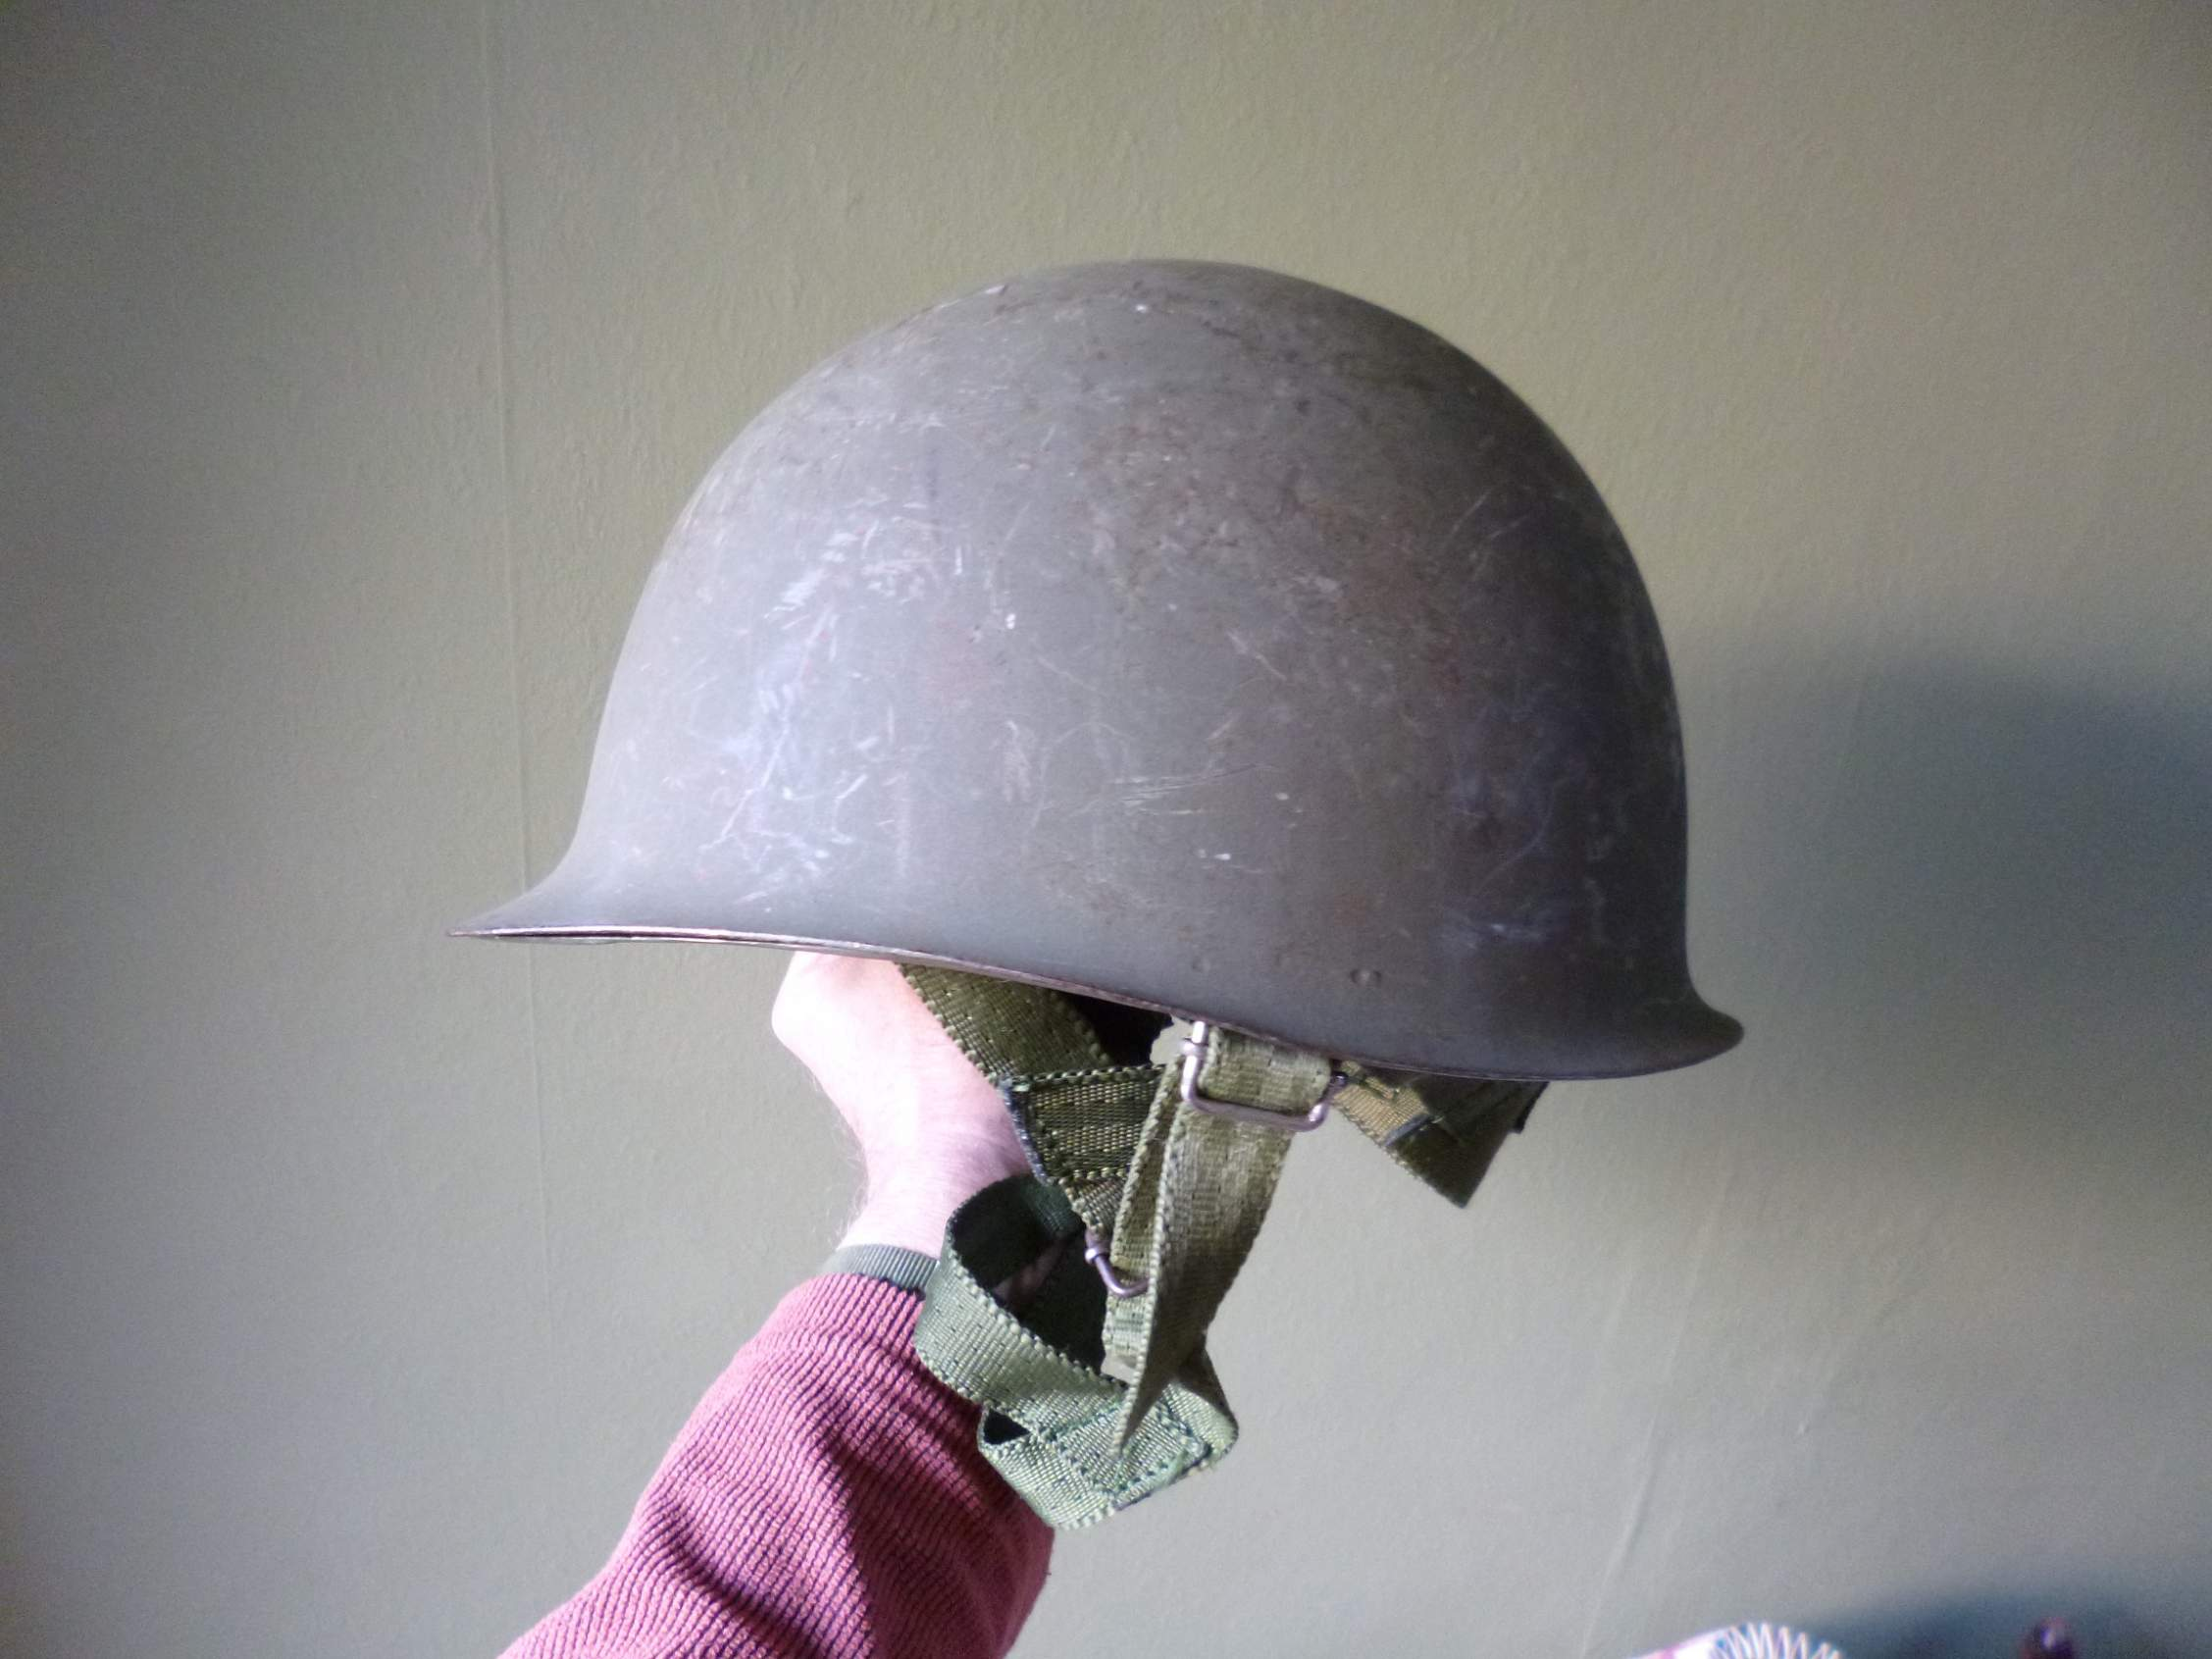 832599d1430137067-spanish-m65-otan-f1-calmero-helmet-p1010489.jpg